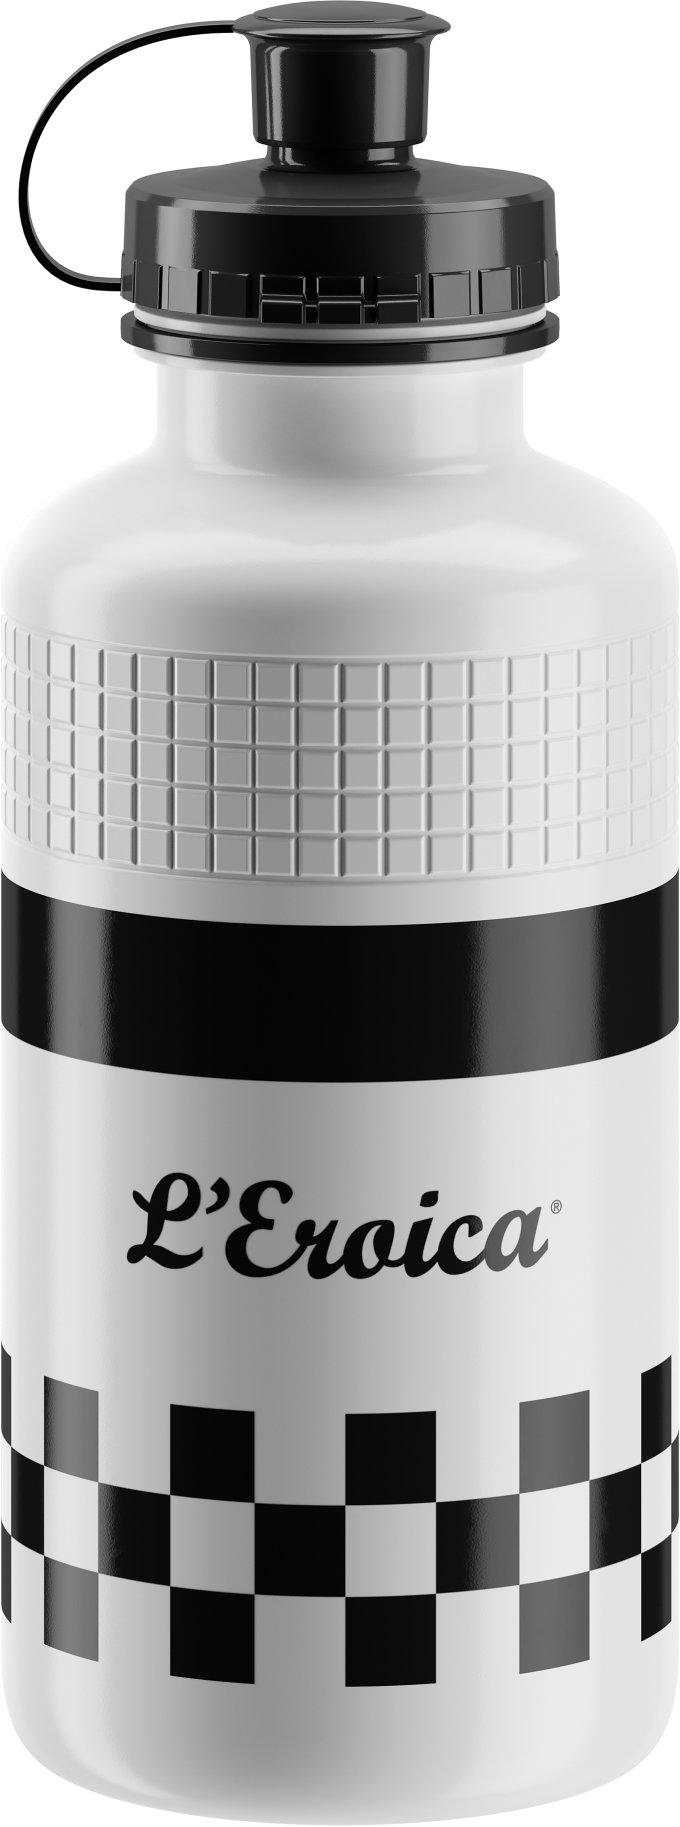 Elite láhev VINTAGE L'EROICA, bílá FRA Classic, 500 ml